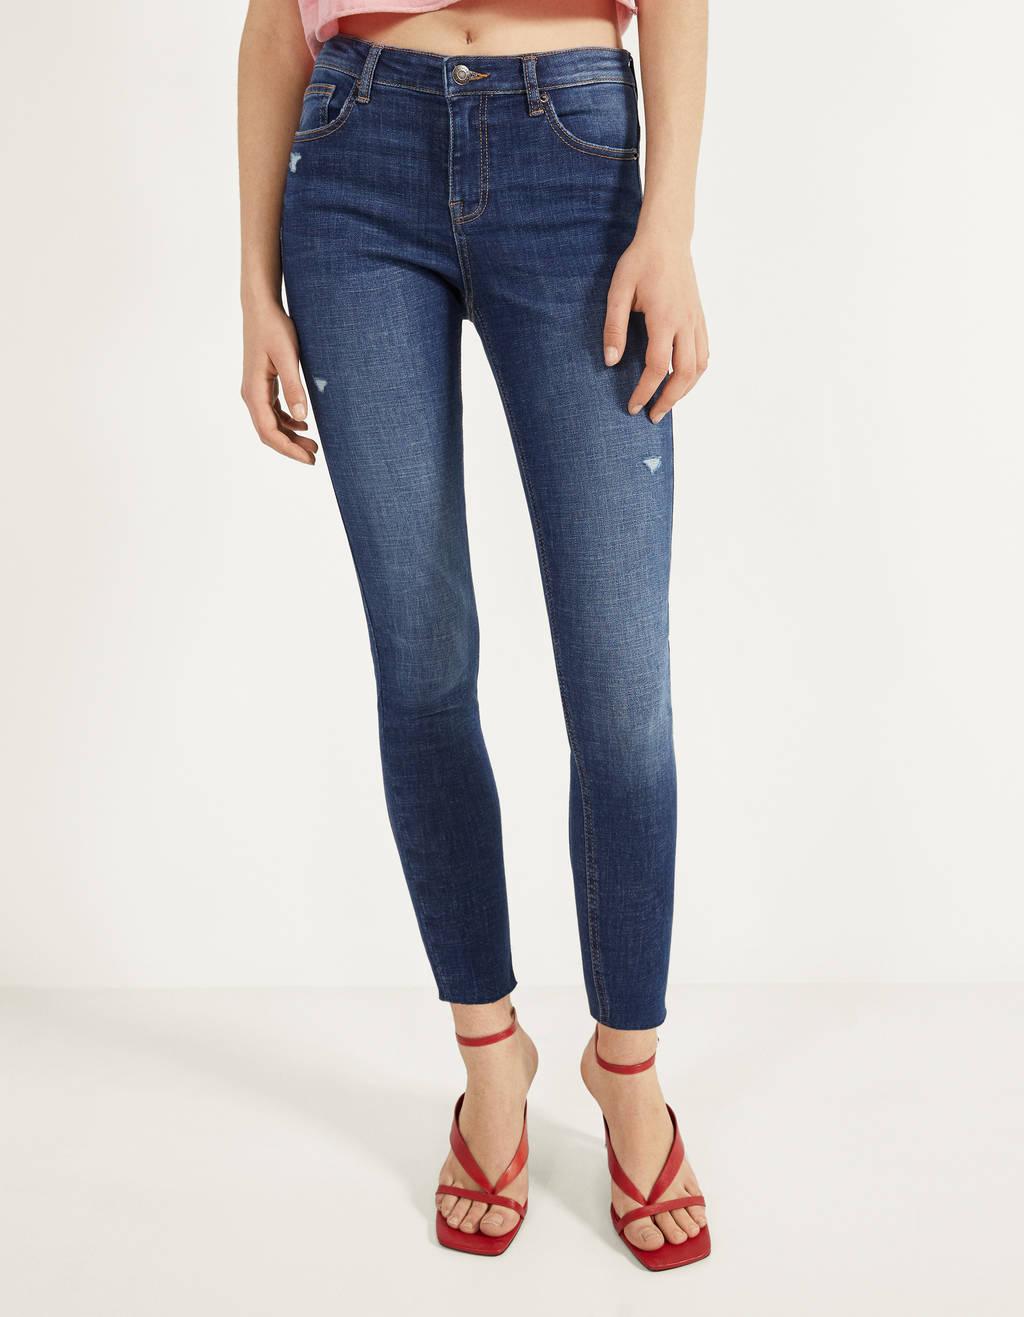 Mid-waist push-up jeans